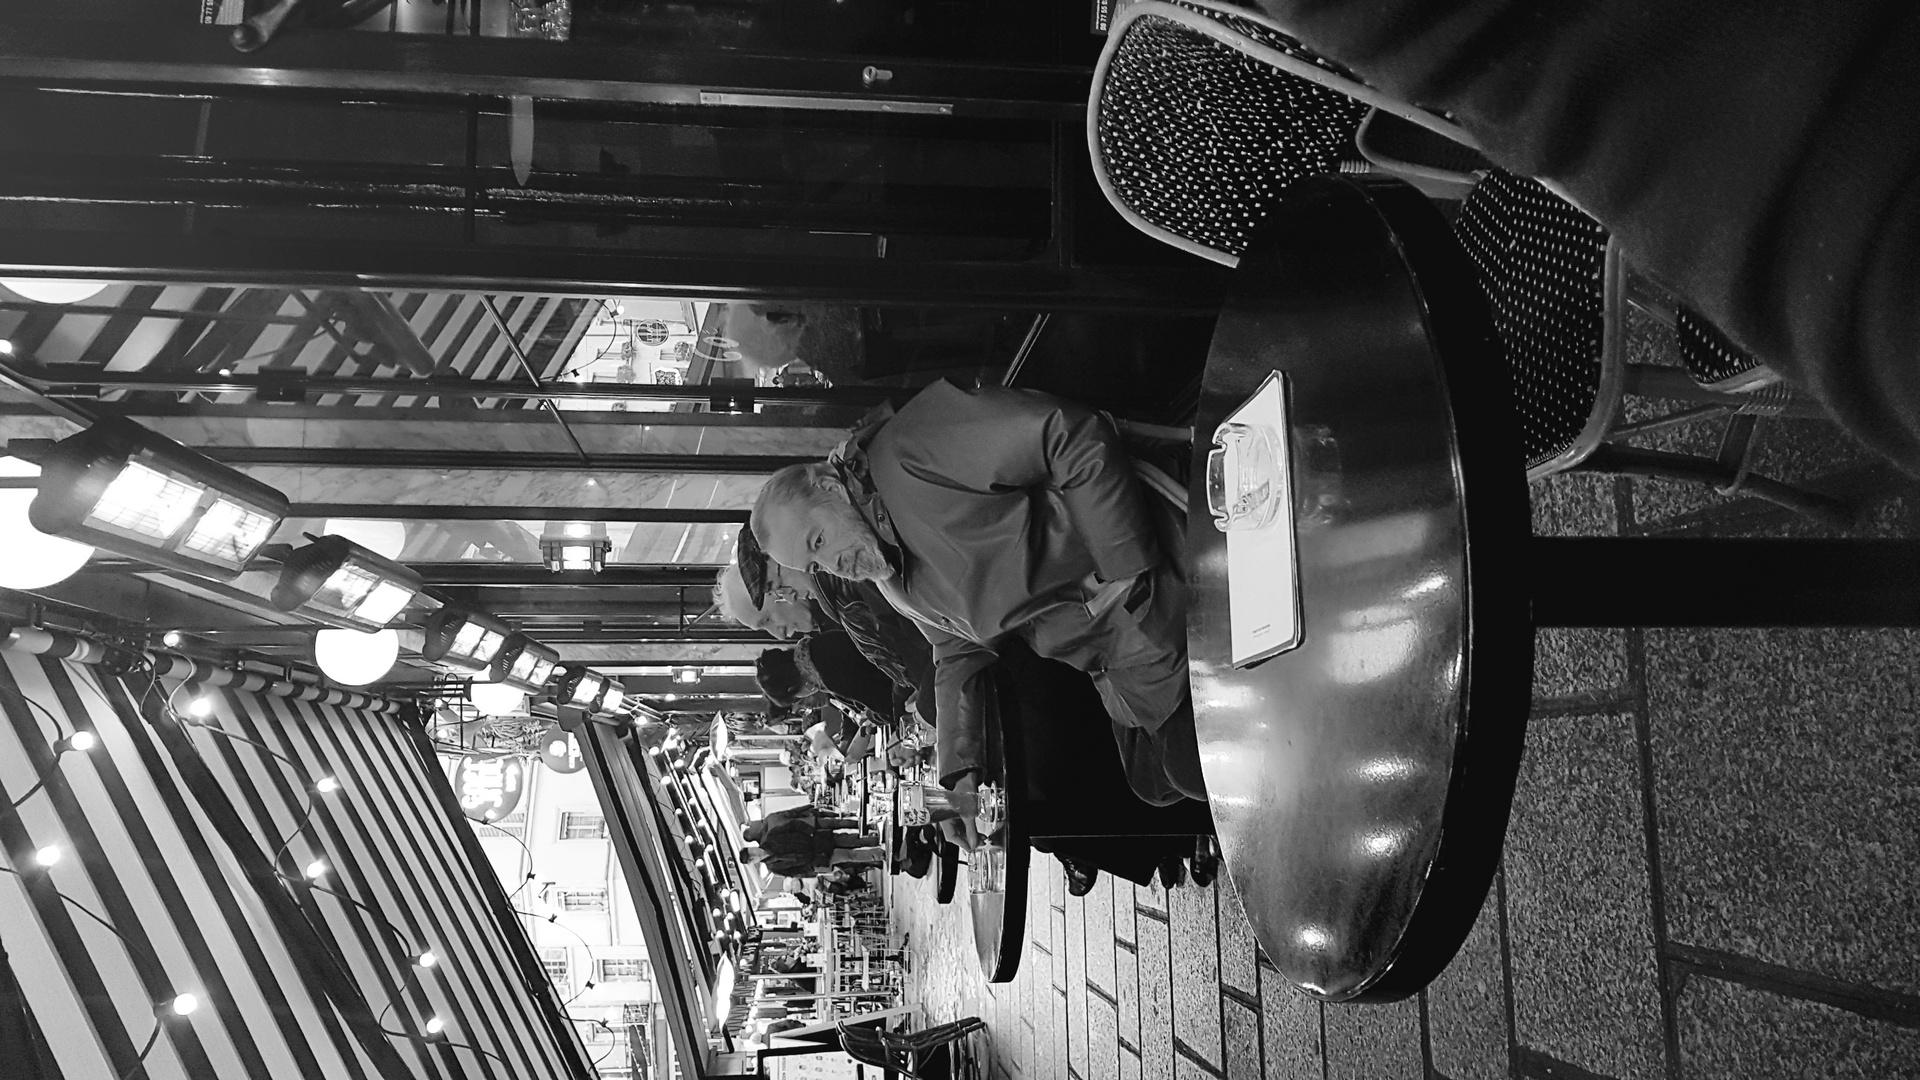 Rue animée - Paris